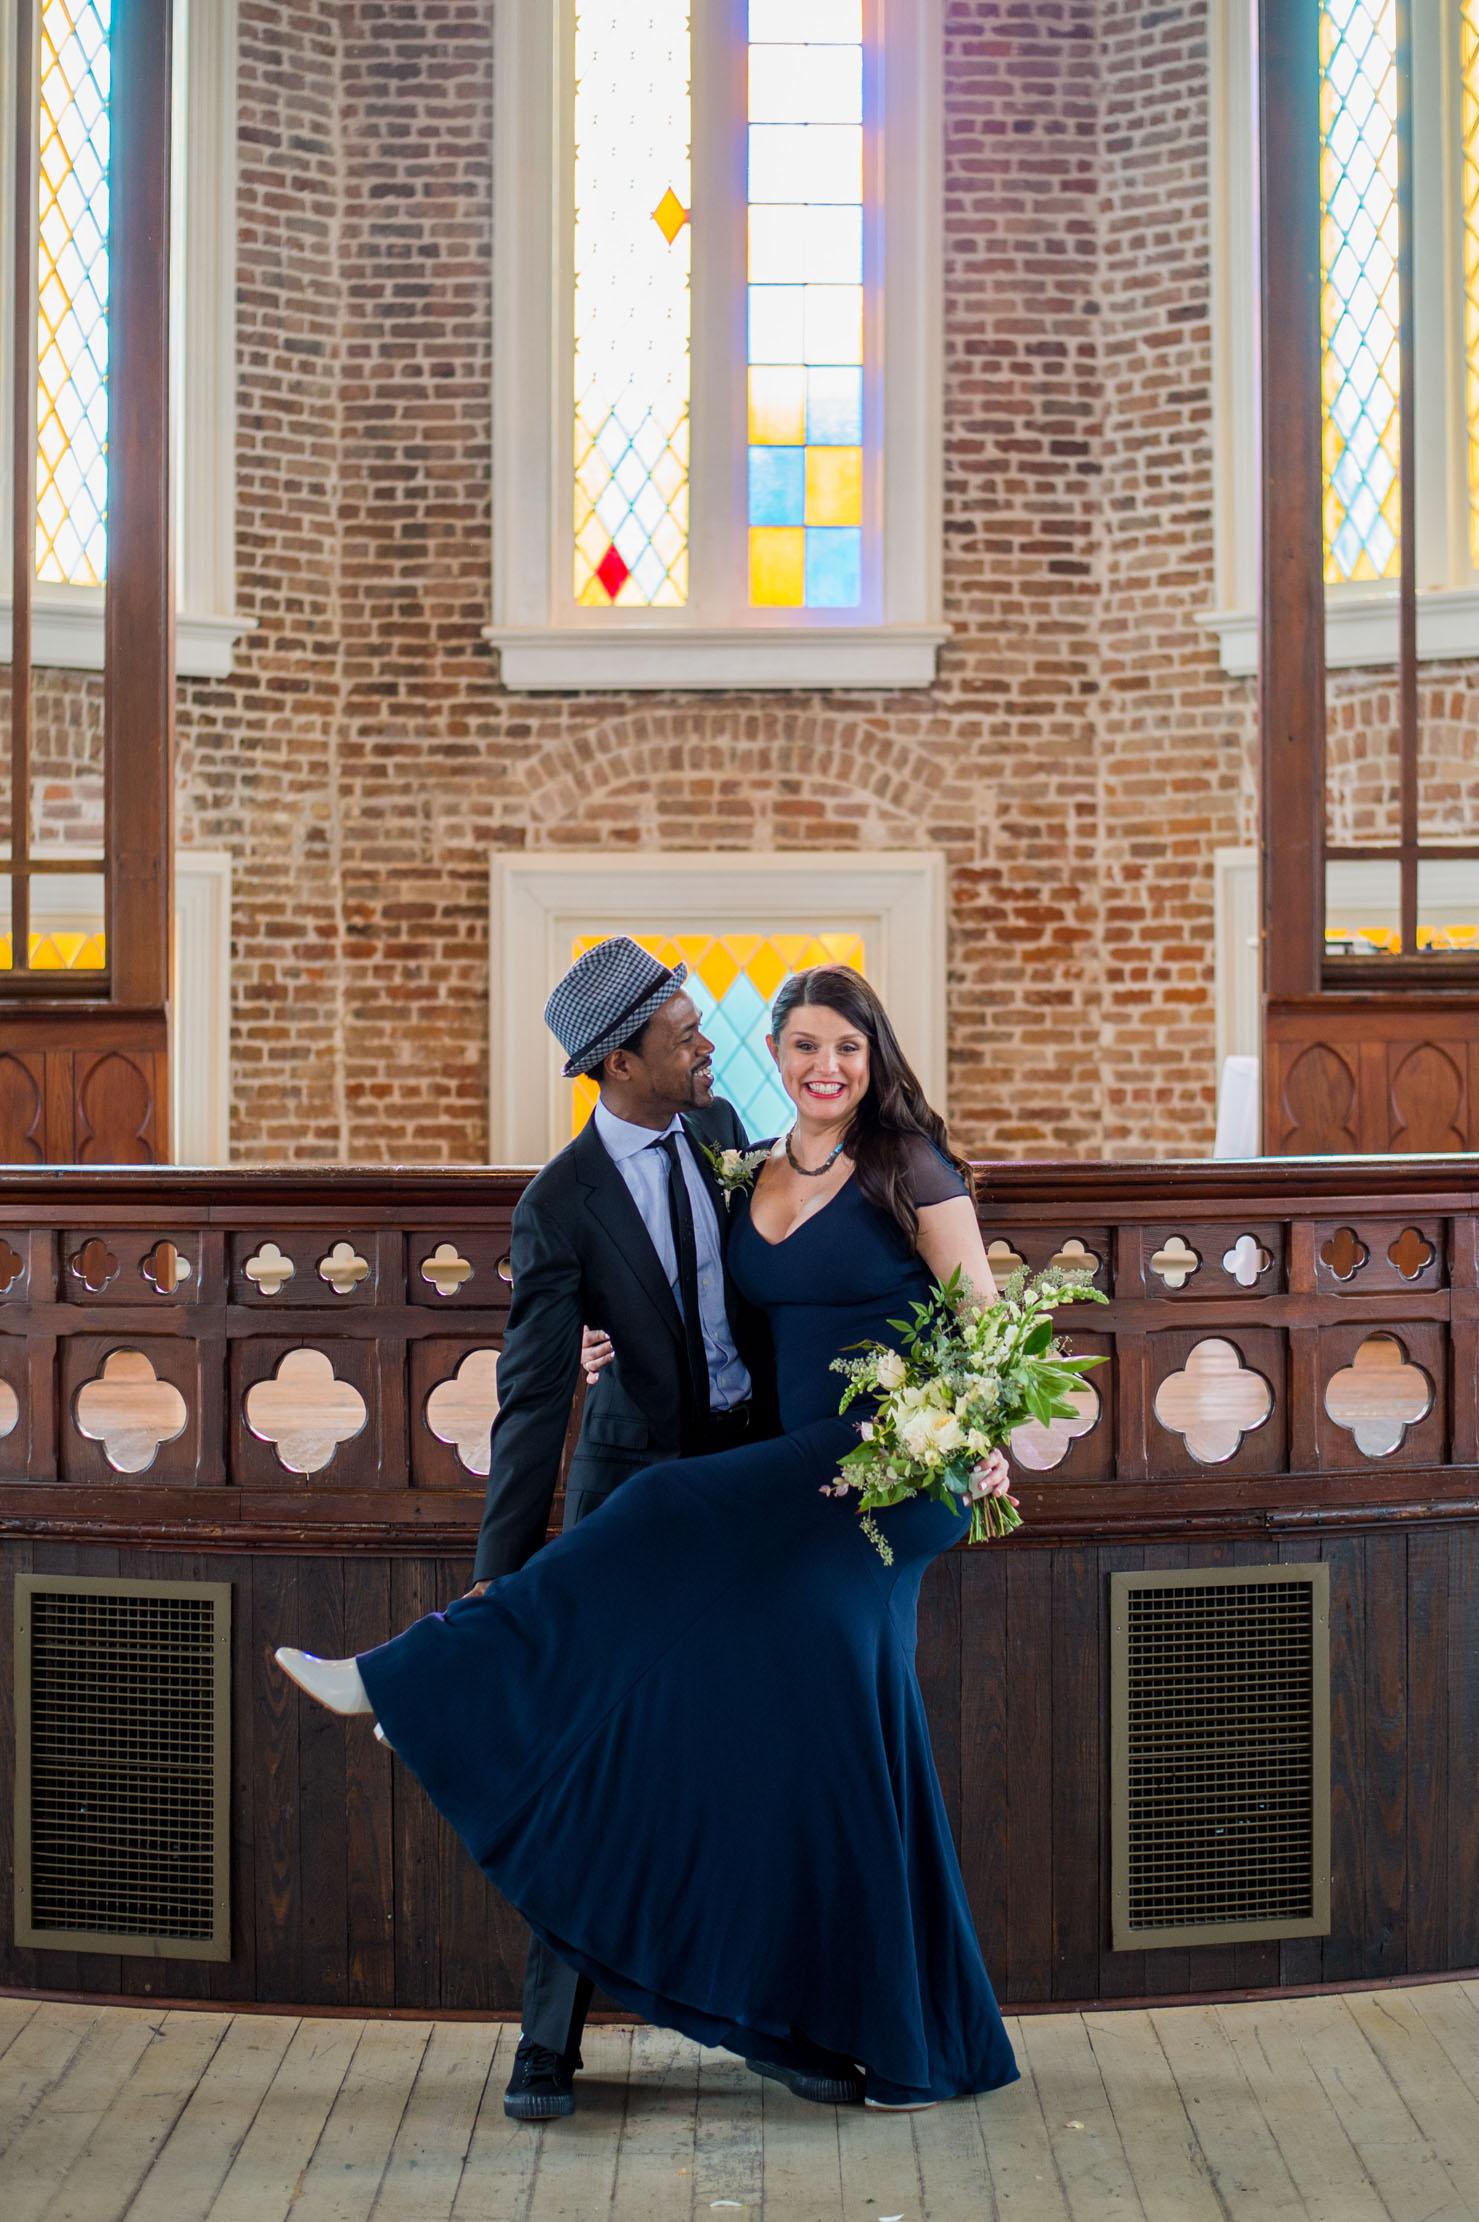 NOLA-Felicity-Church-Ace-Hotel-Wedding-1040.jpg